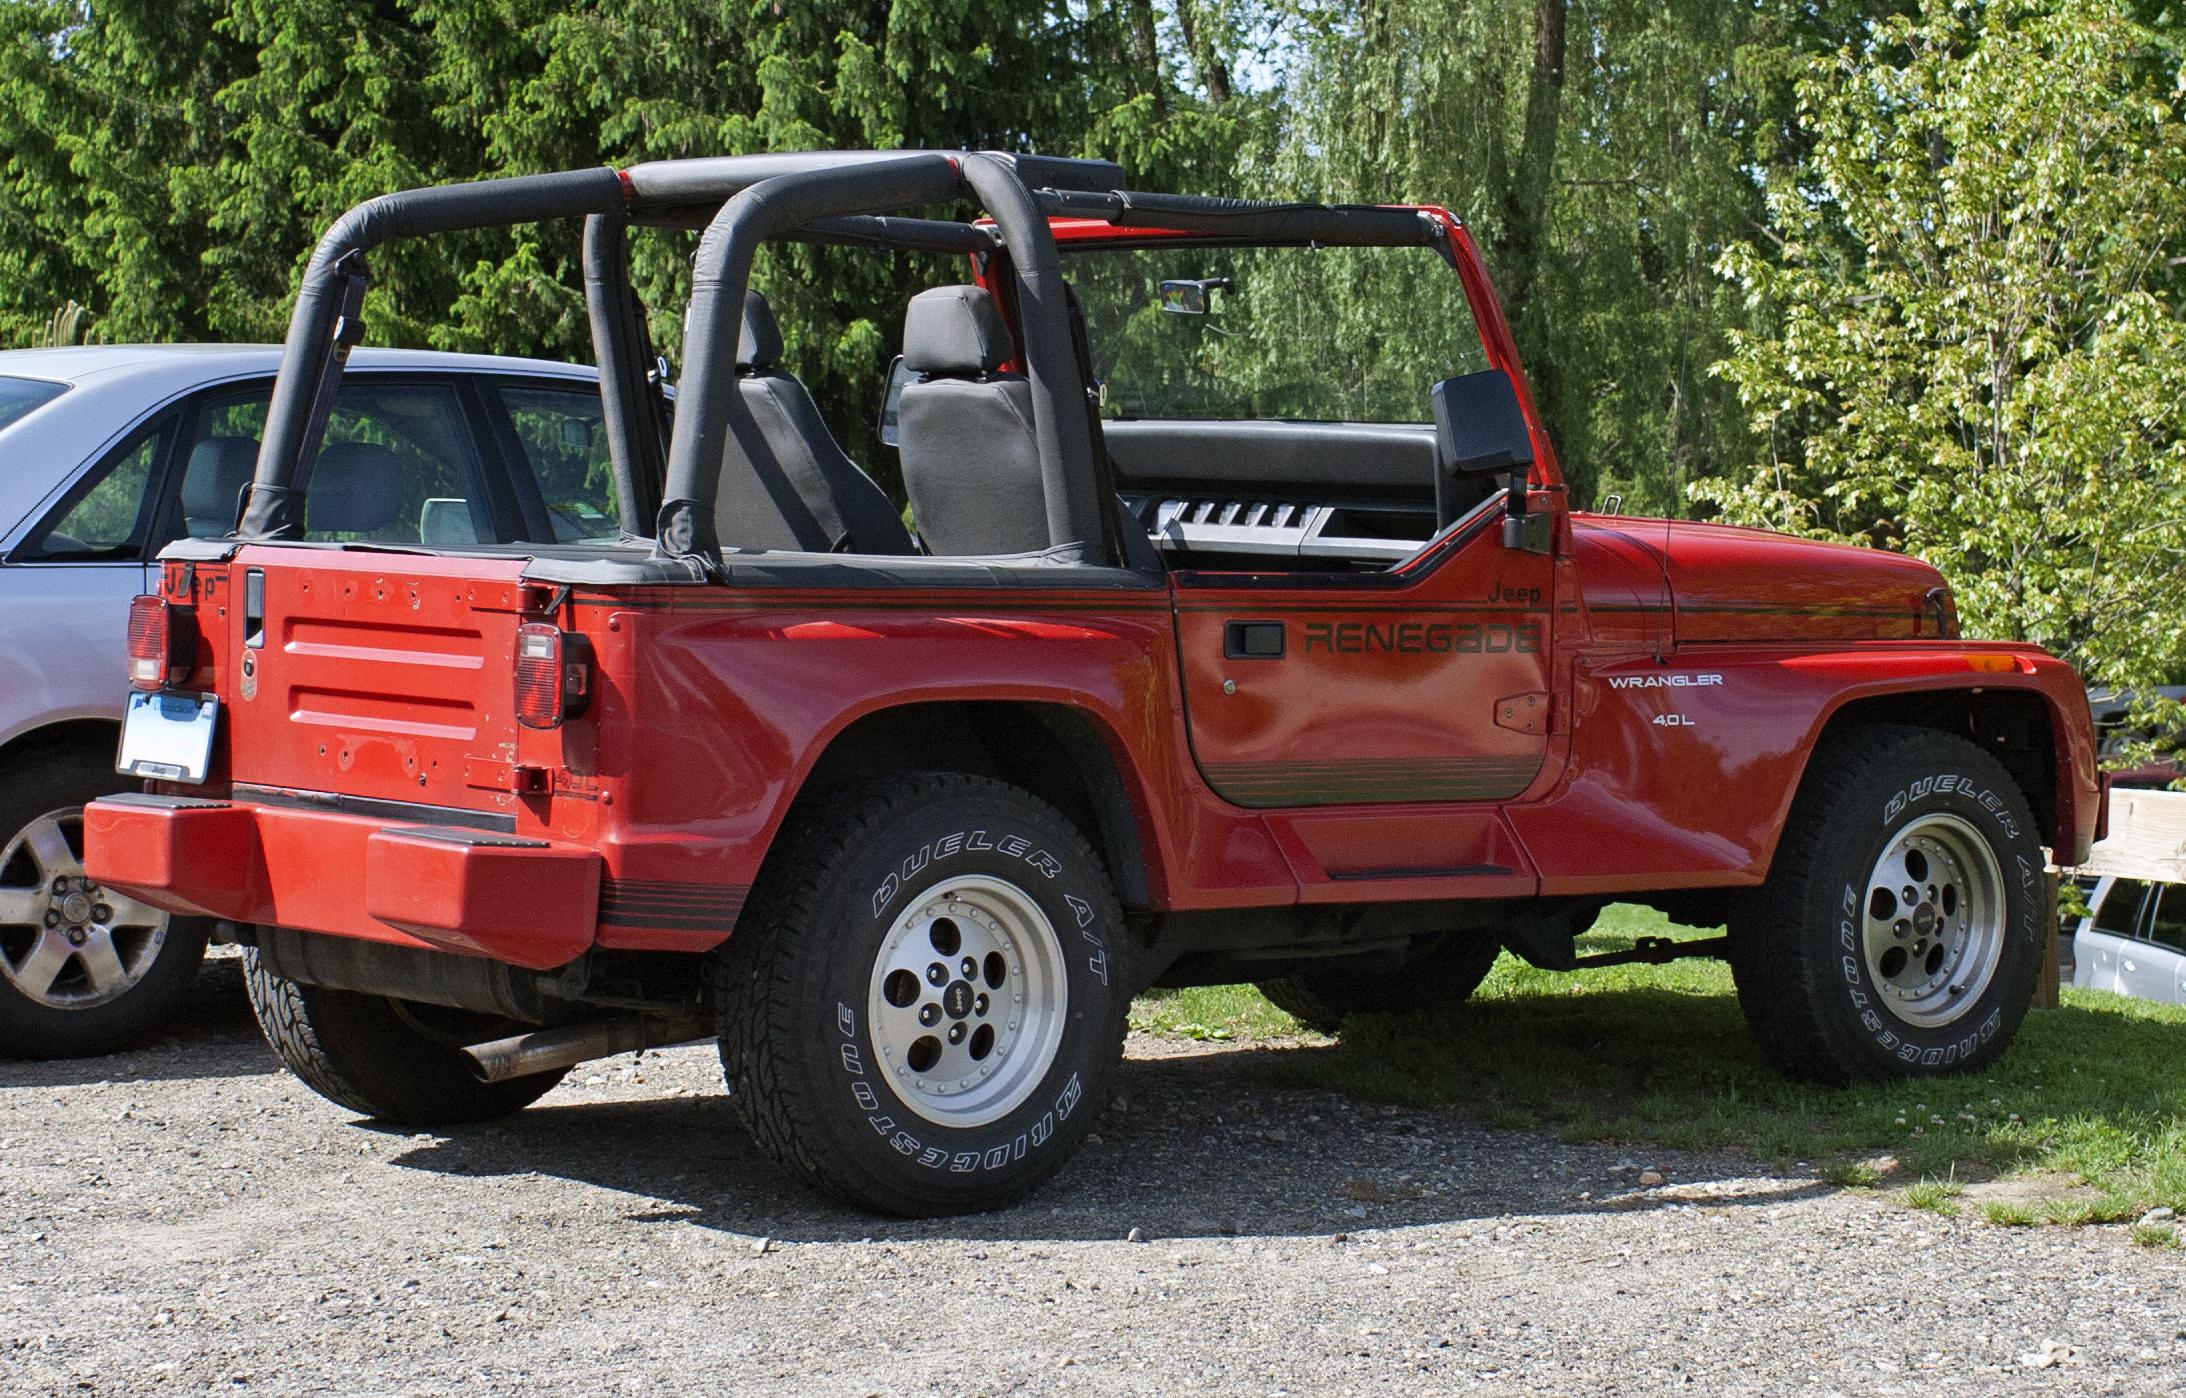 Jeep Wrangler Renegade >> Jeep Wrangler Renegade Picture 14 Reviews News Specs